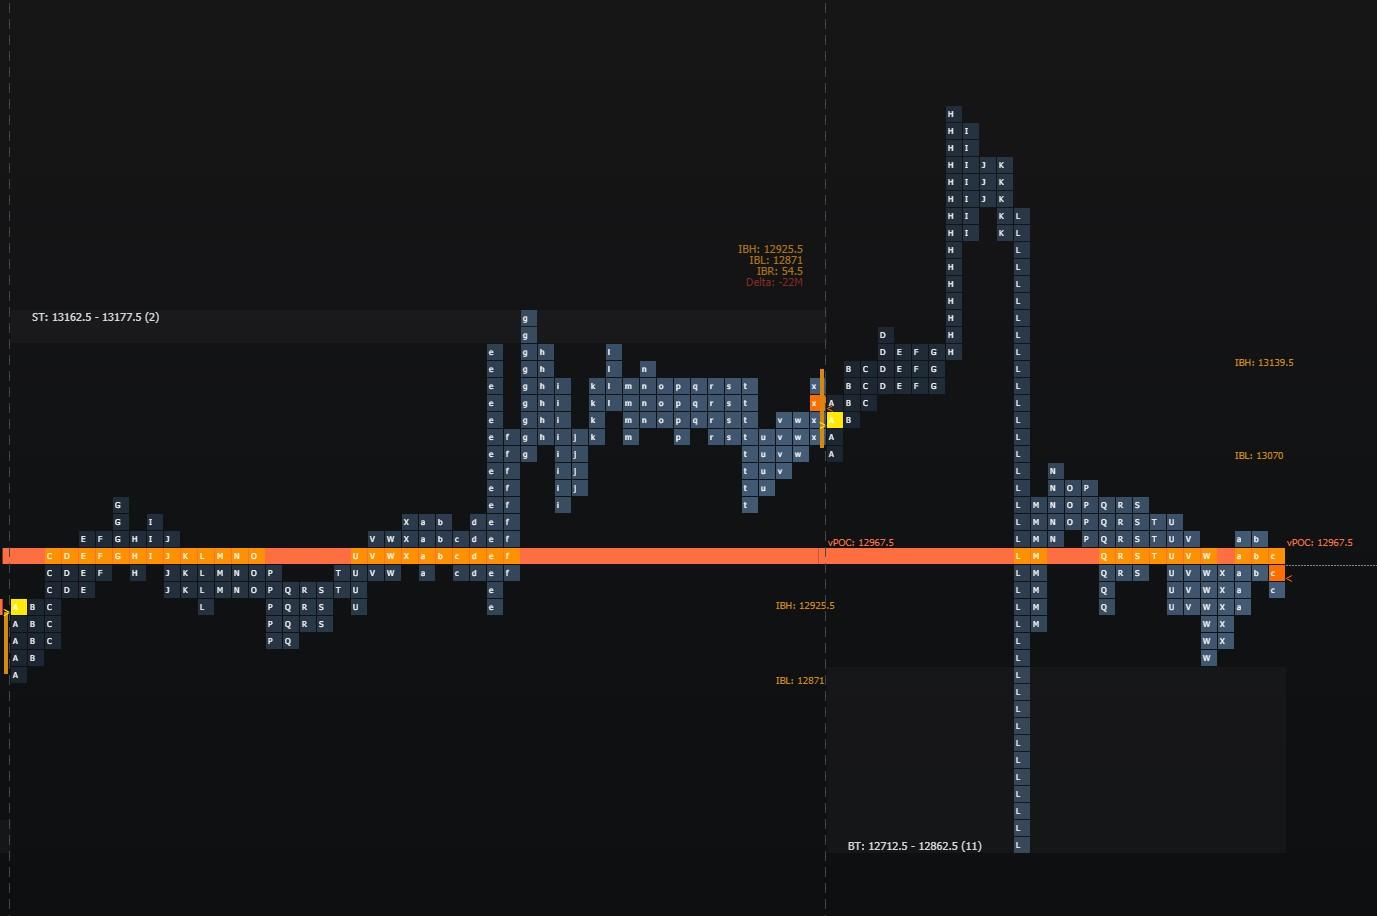 bitcoinmarketprofile